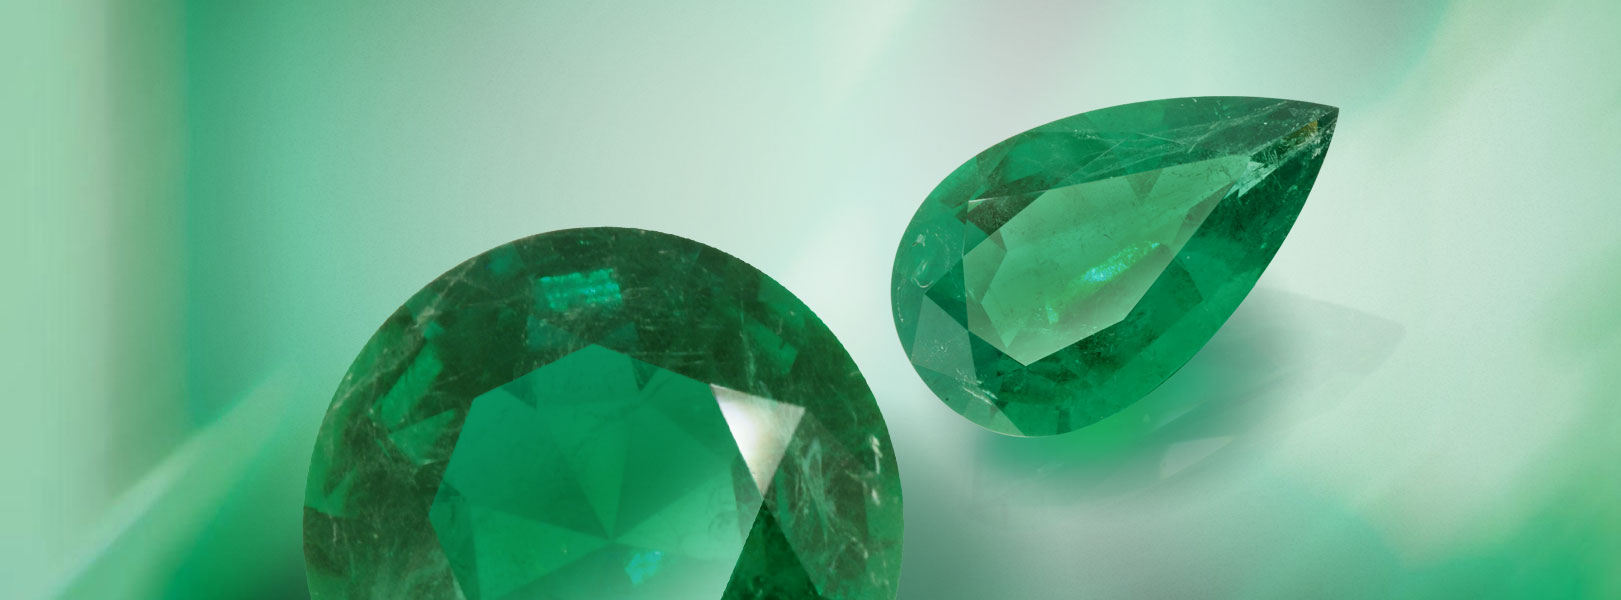 ColEmerald.com - sparkling green